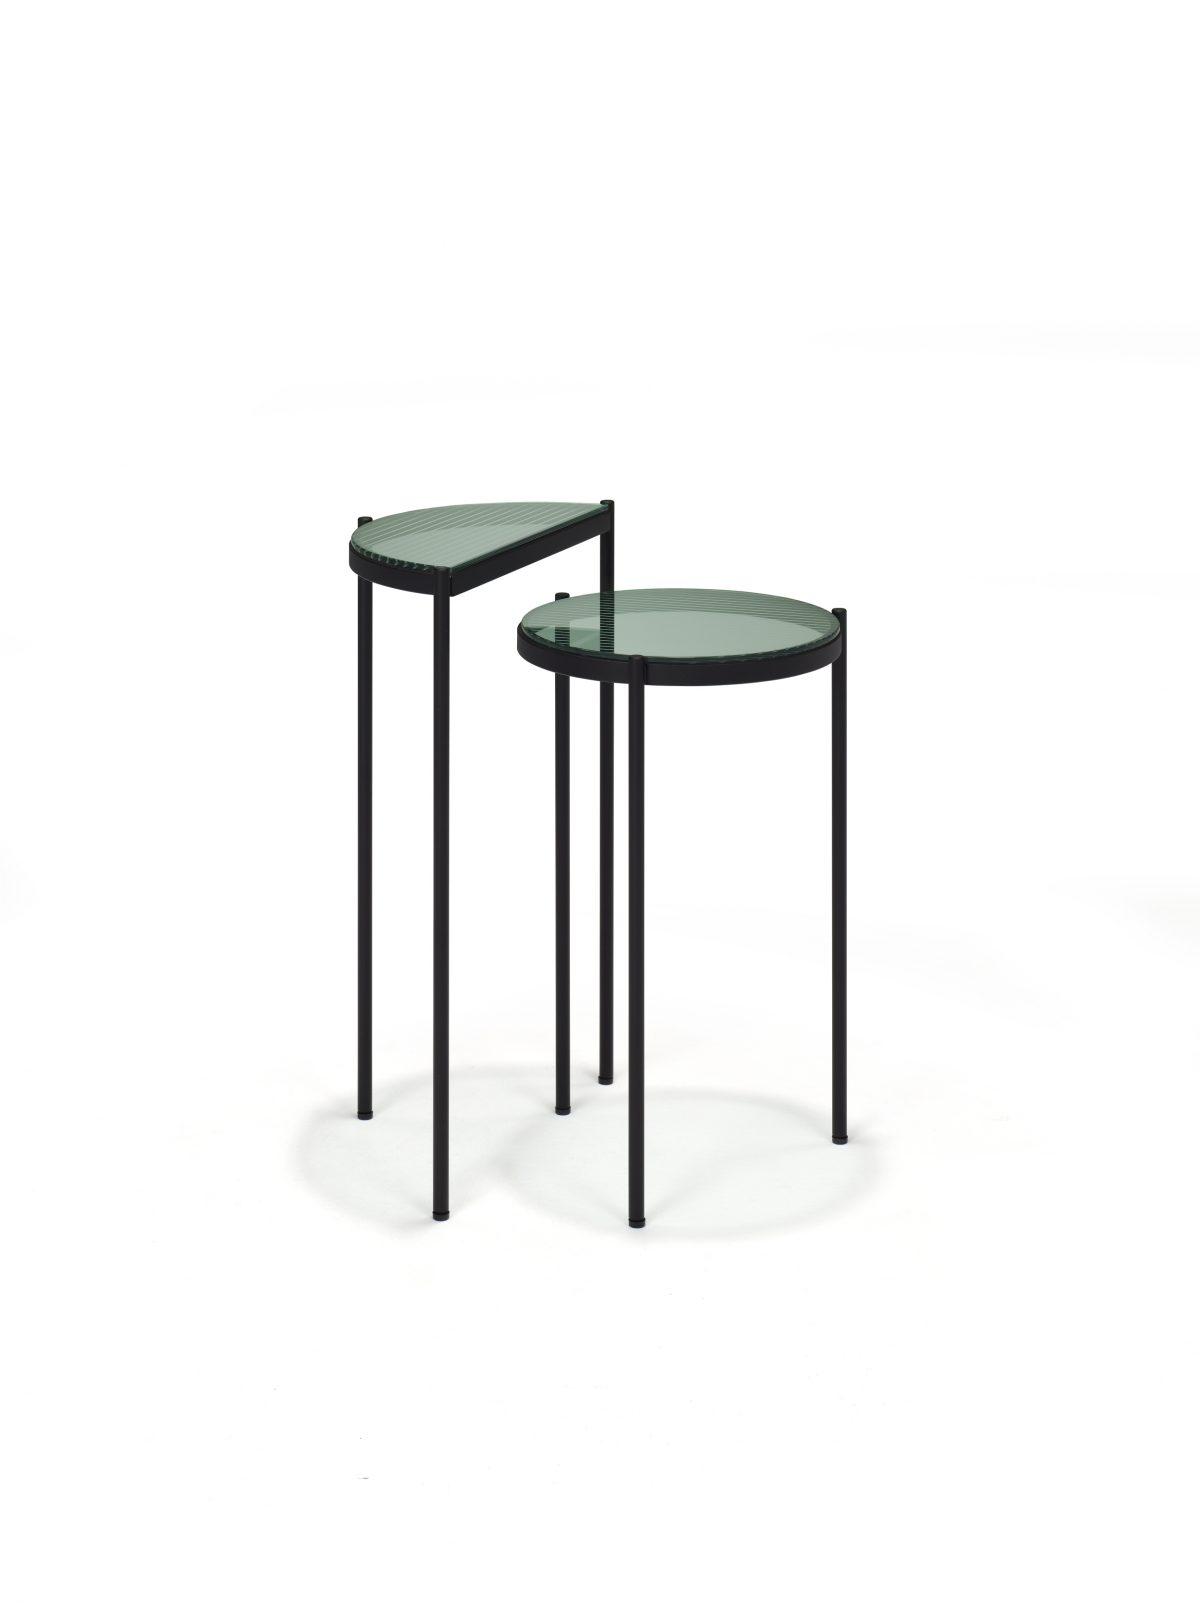 LYN Bijzettafel Set Visser Meijwaard Groen Glas Frame Zwart JOSHH& HELDERR44